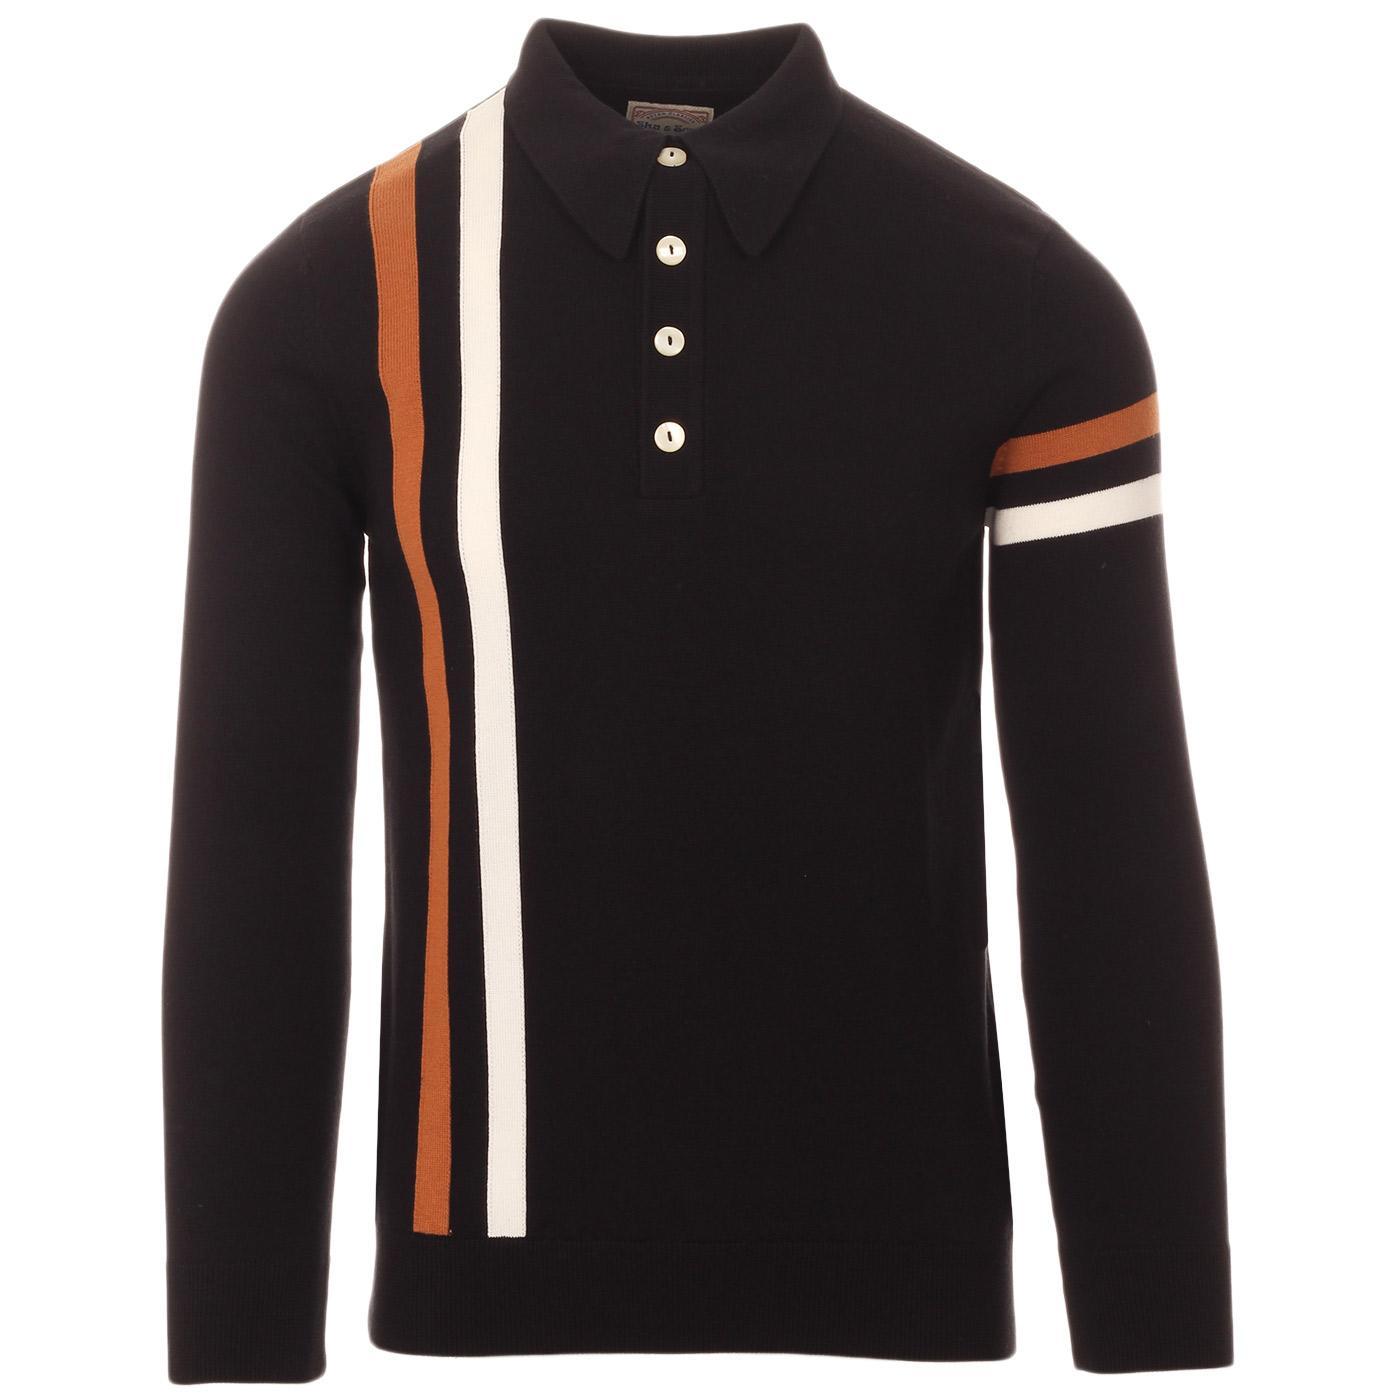 SKA & SOUL 60s Mod Racing Stripe Knit Polo Shirt B